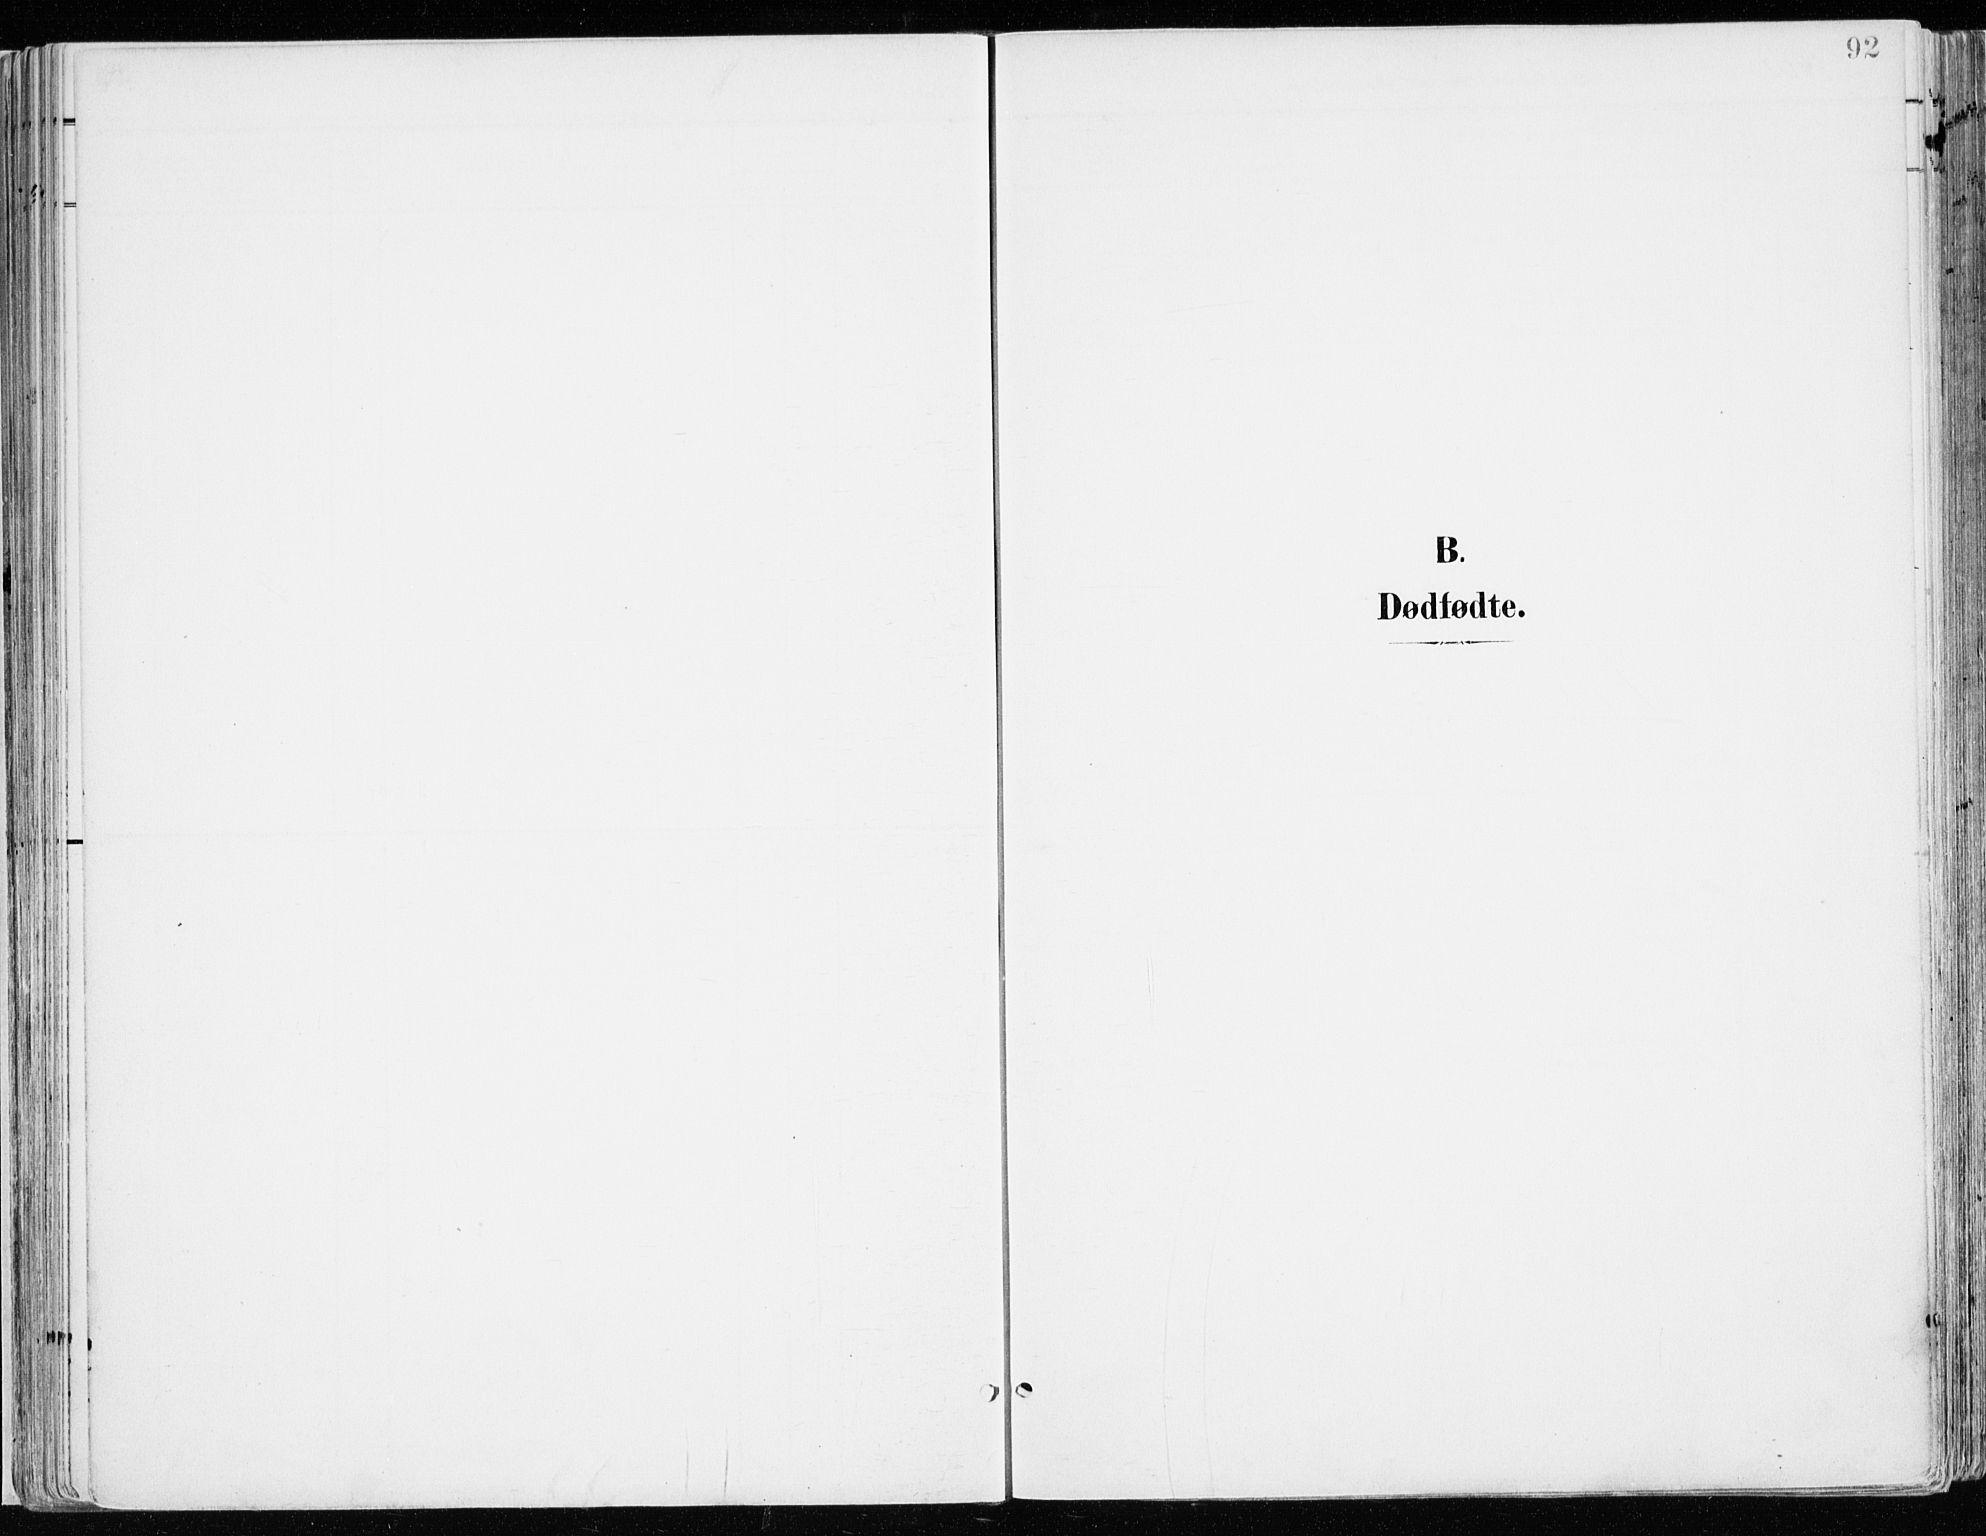 SAH, Nord-Odal prestekontor, Ministerialbok nr. 9, 1902-1926, s. 92